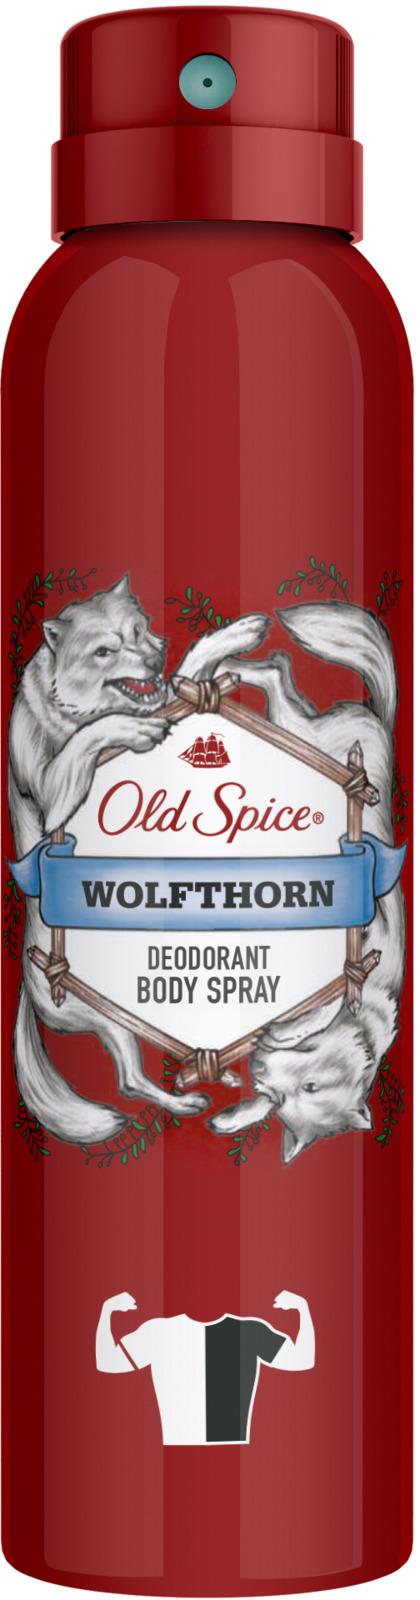 Дезодорант аэрозольный Old Spice Wolfthorn, 150 мл